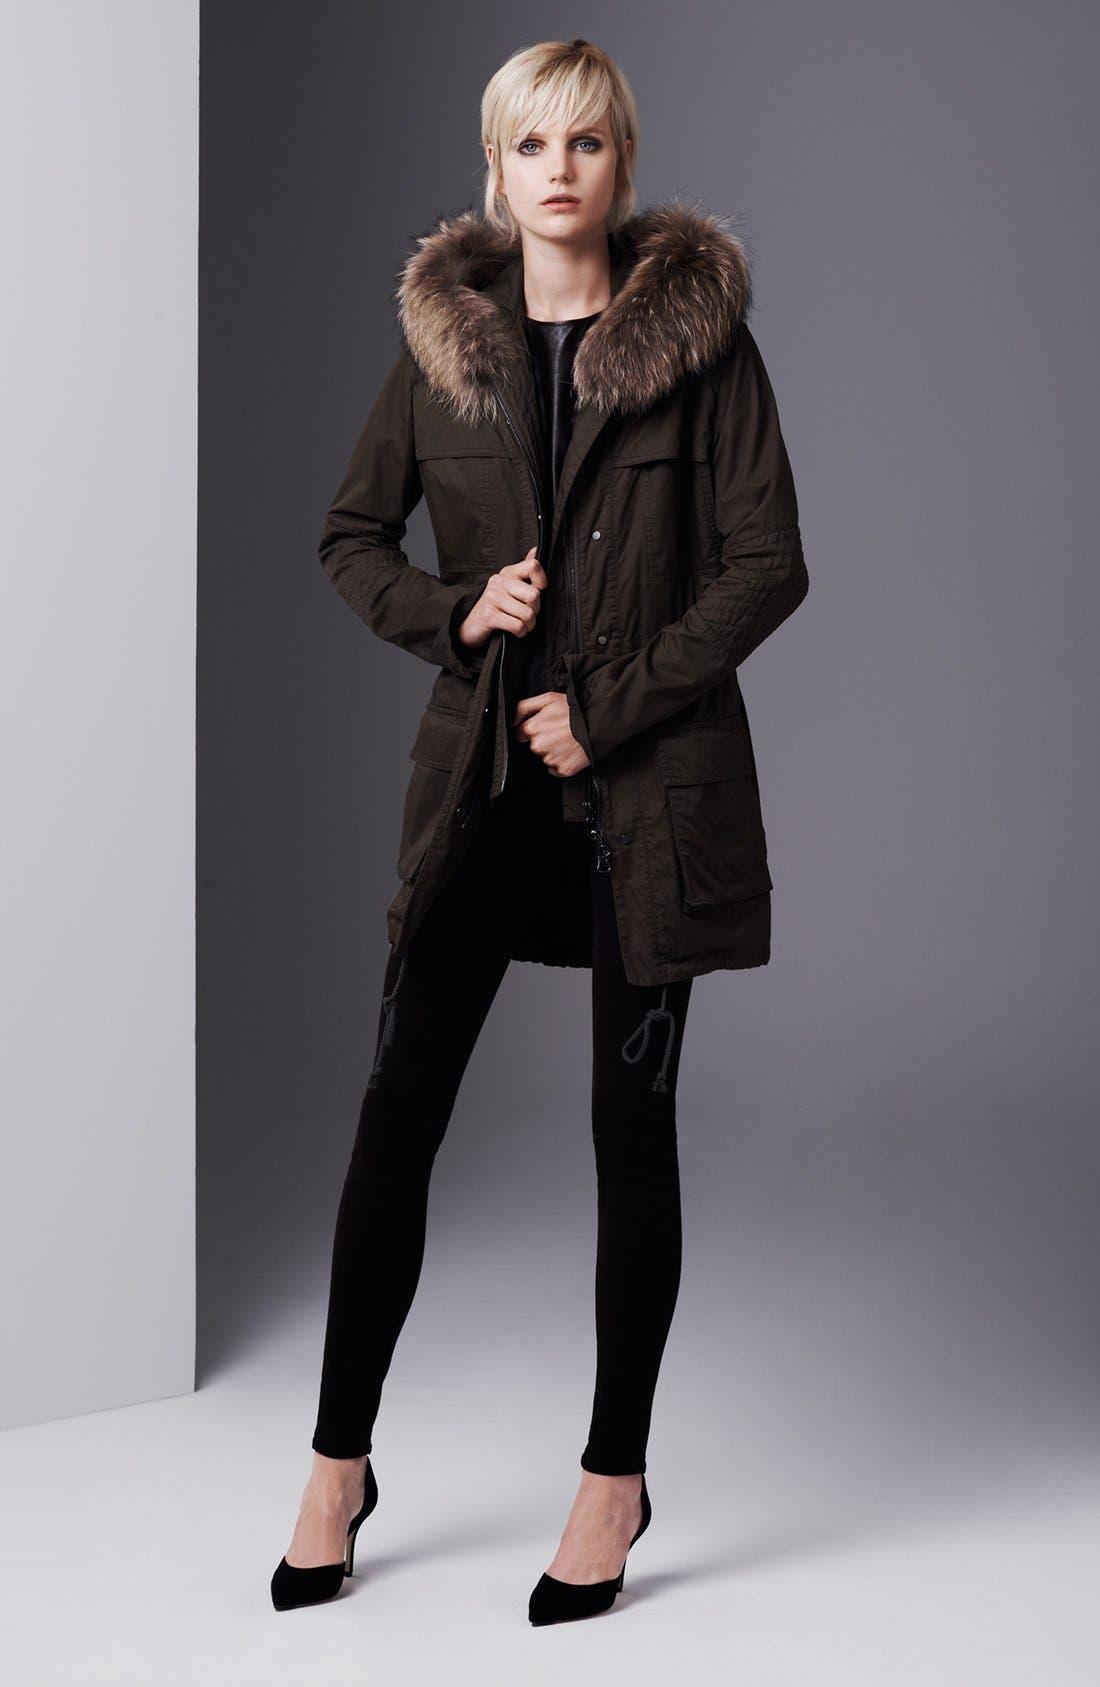 Main Image - Vince Genuine Coyote Fur Trim Anorak, Leather Tee & Jeans